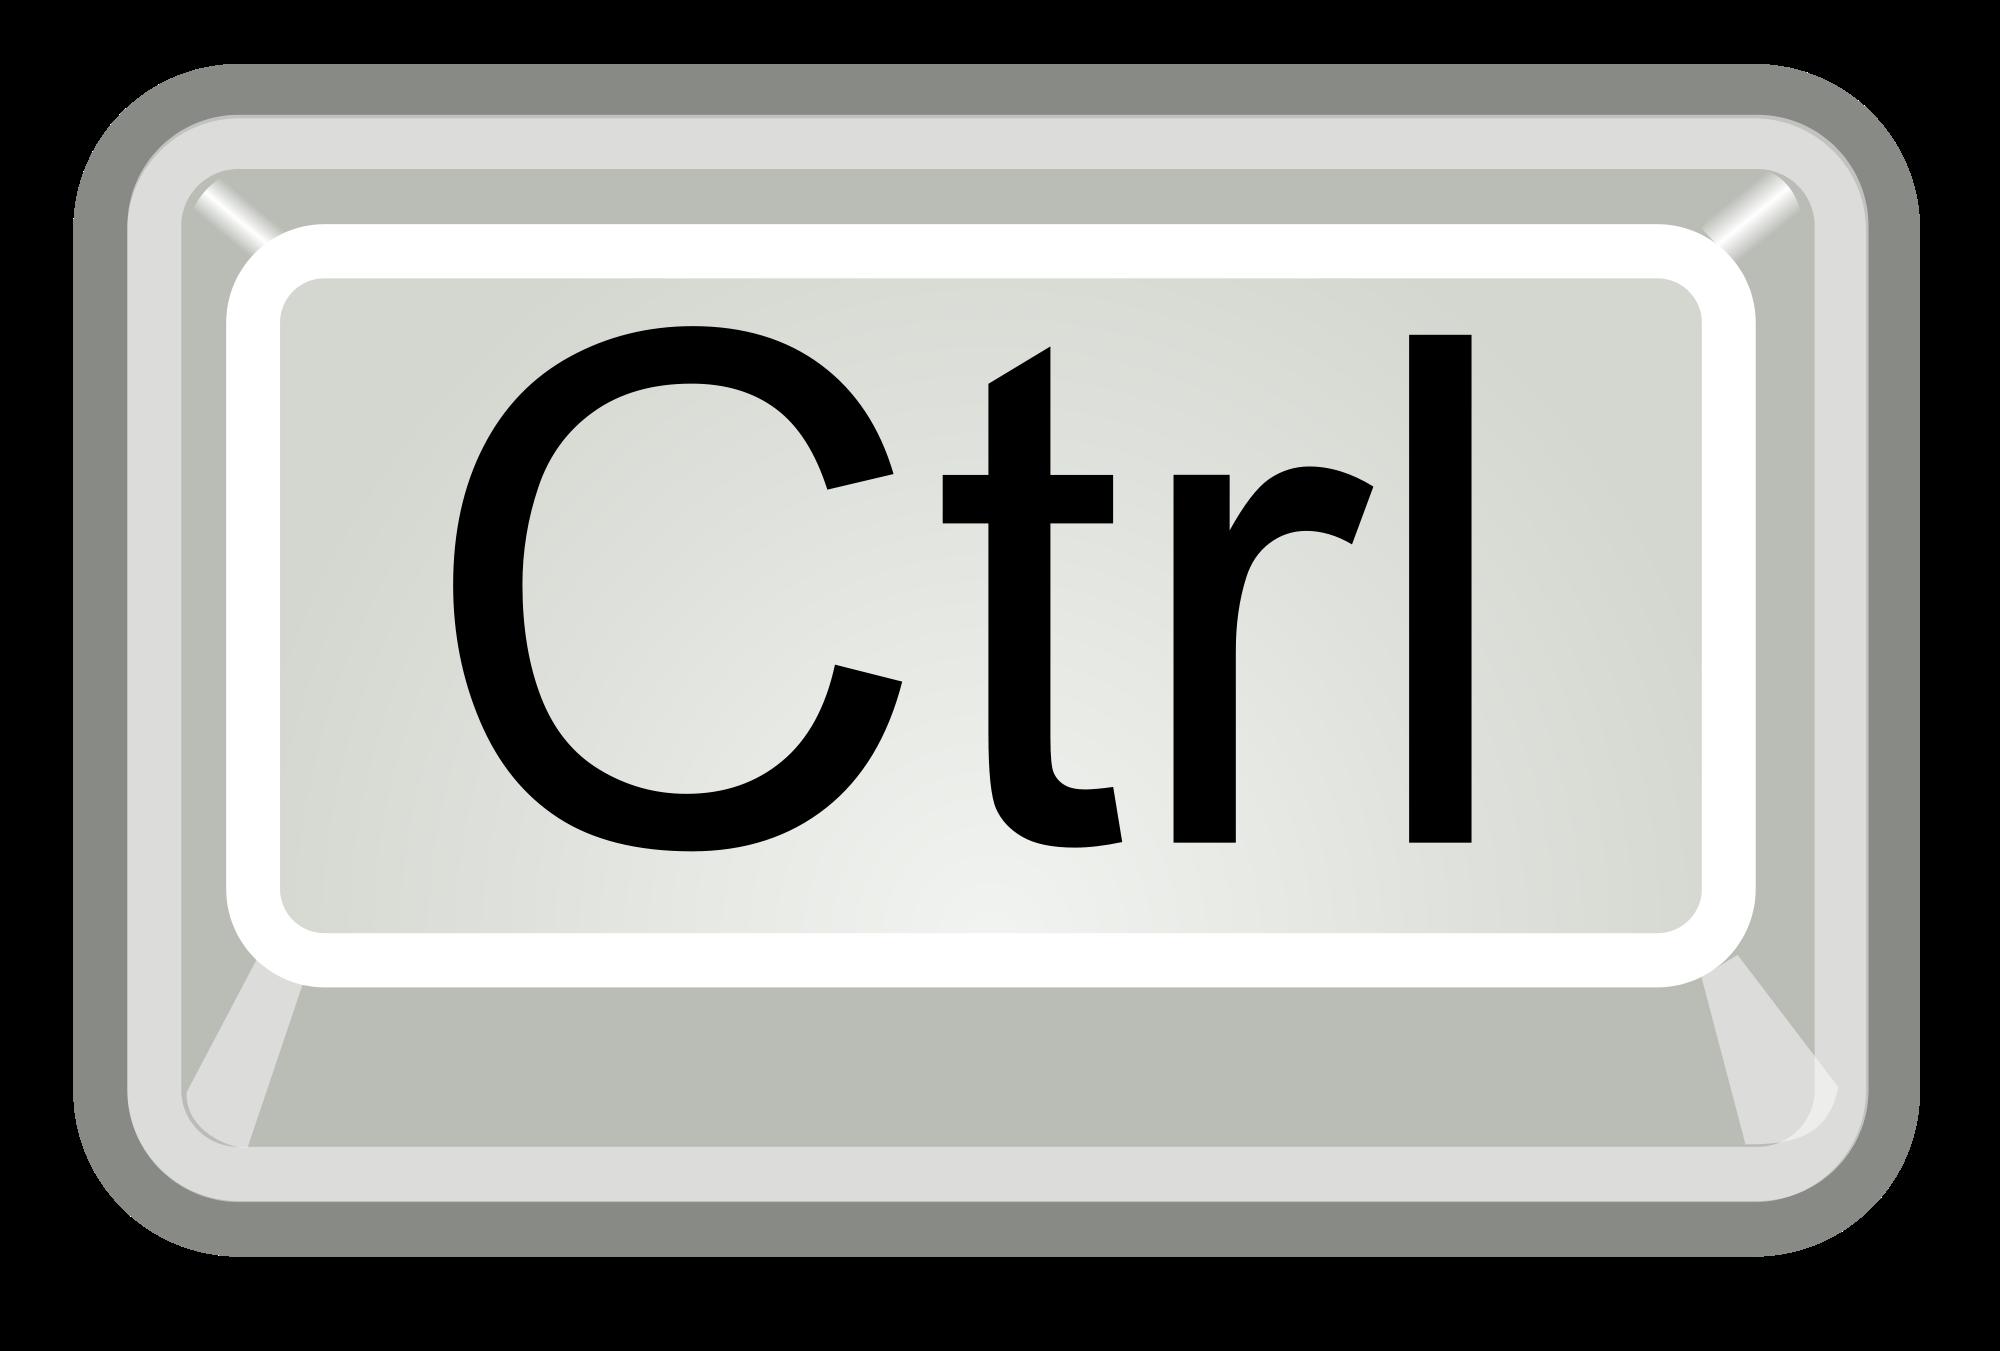 Open PlusPng.com  - Ctrl Key PNG